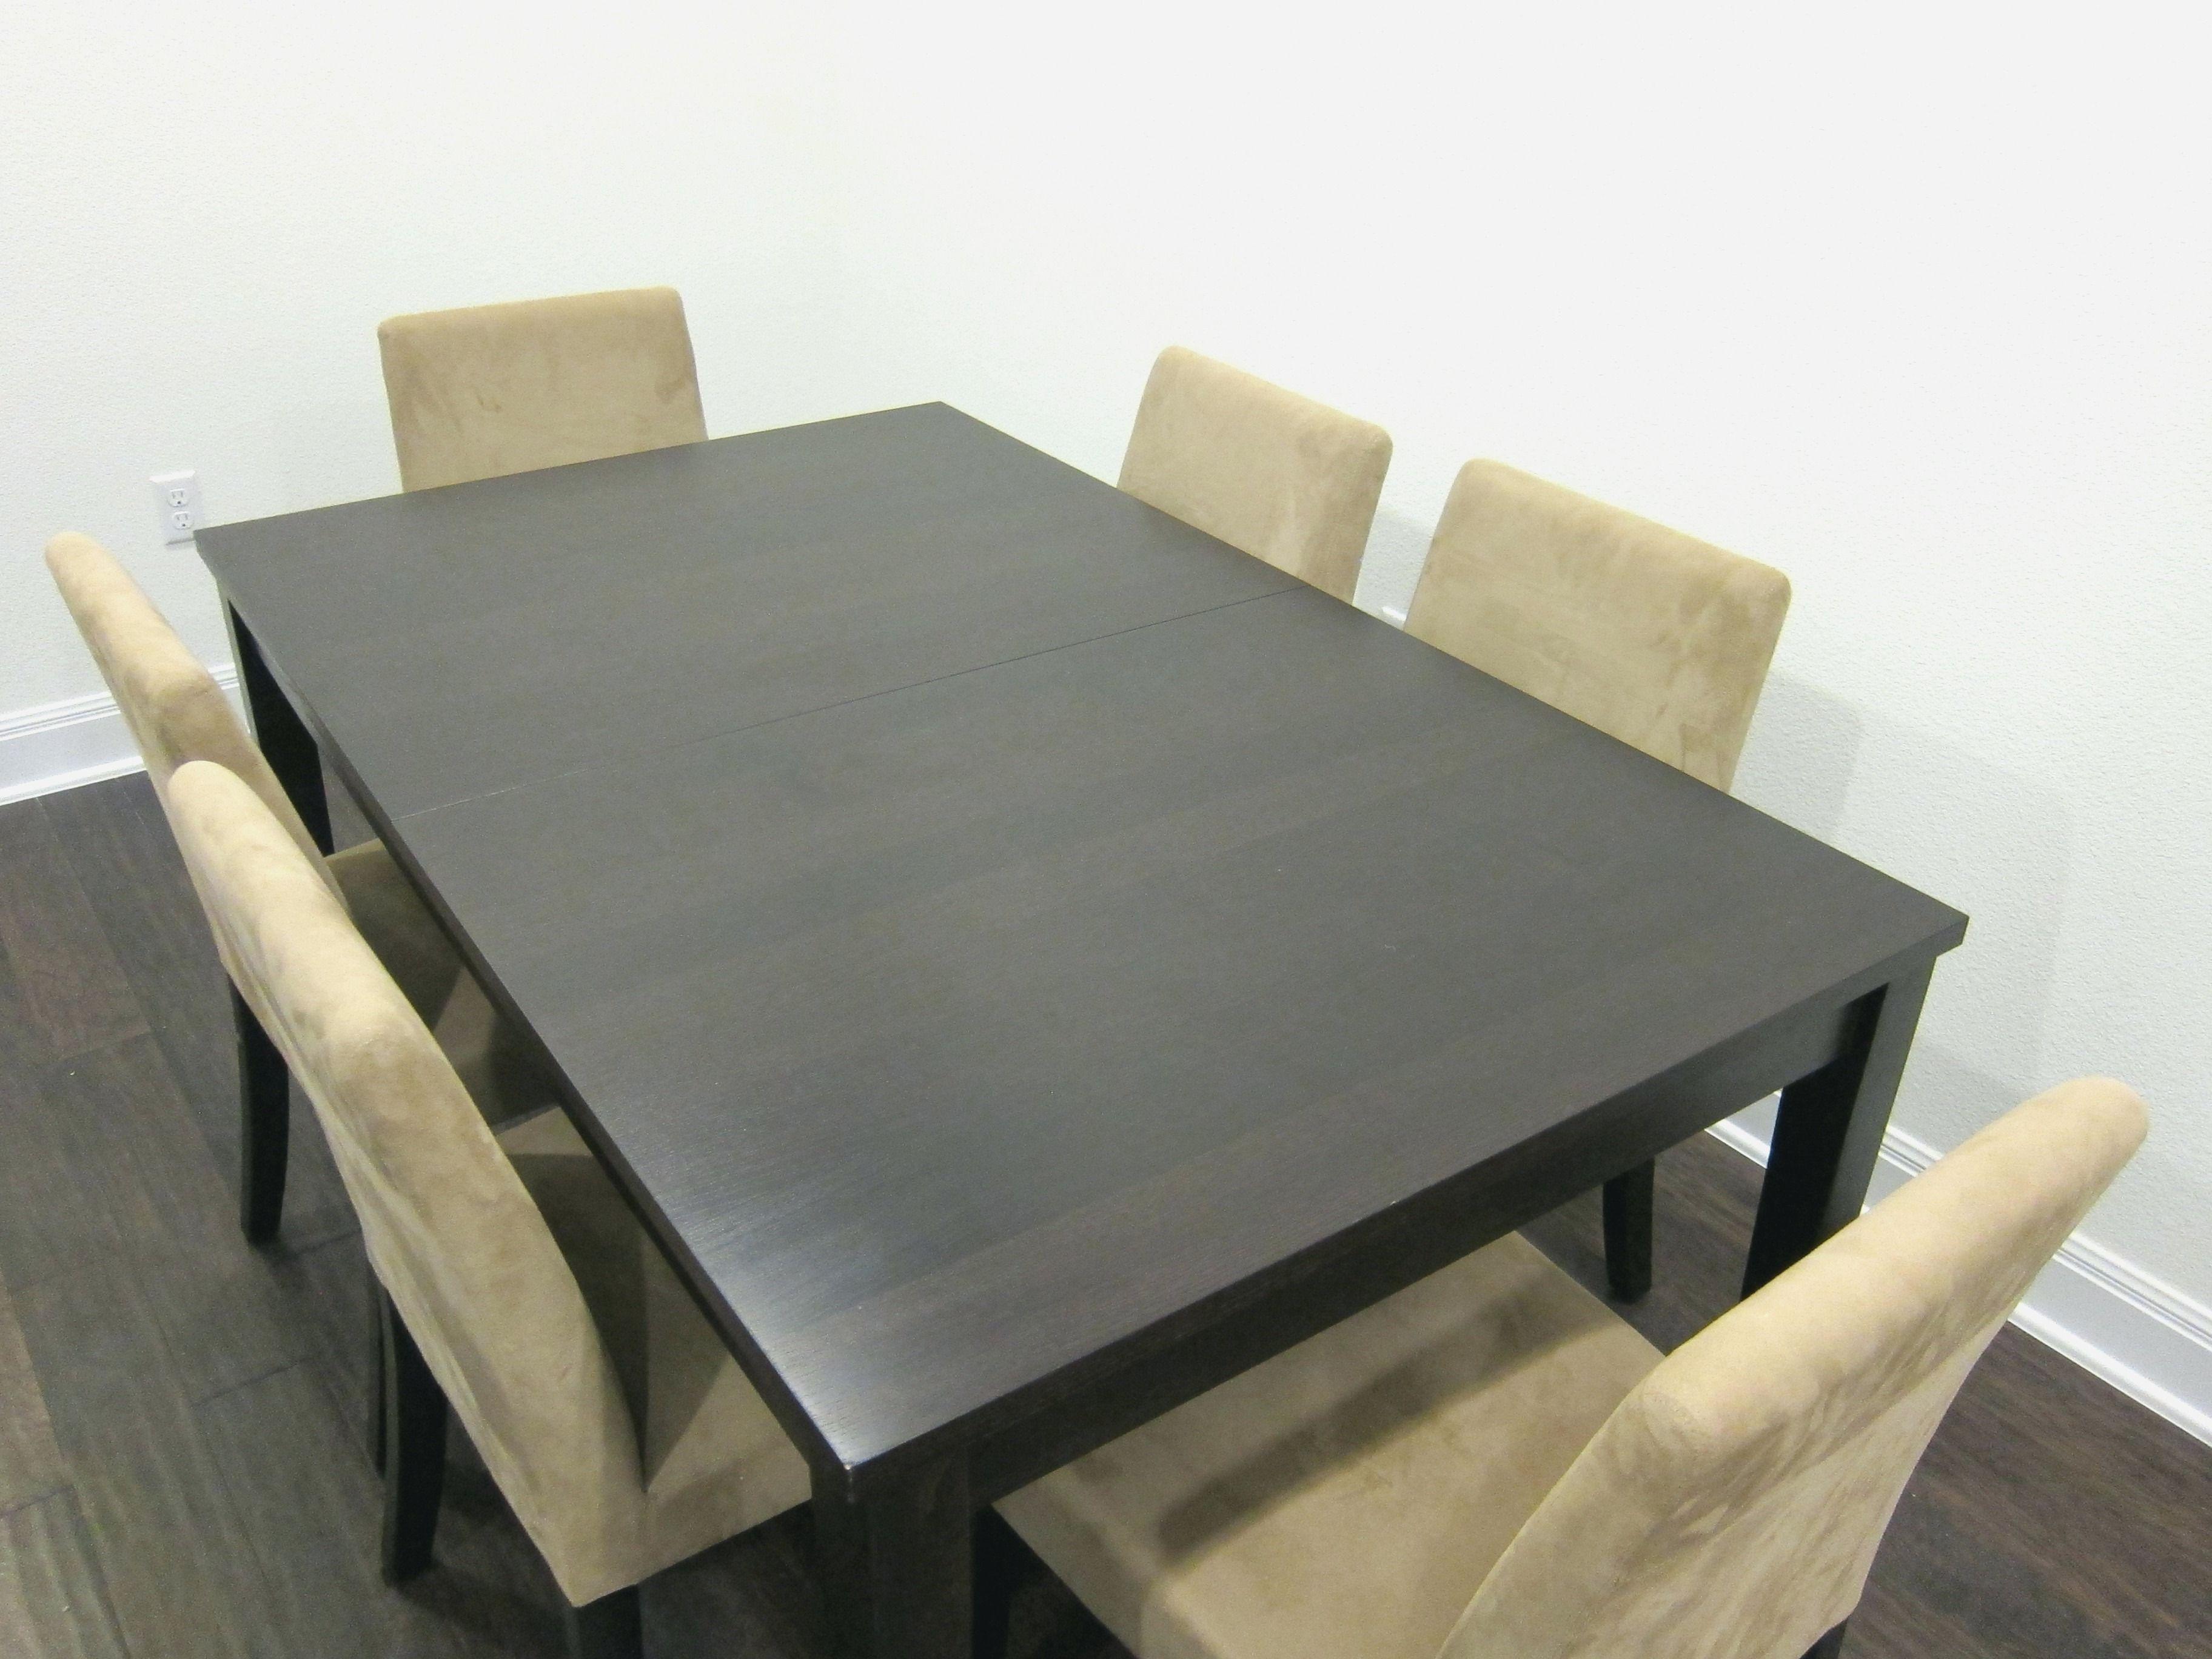 Kiste Und Fass Lounge Sessel   Stühle modern   Pinterest